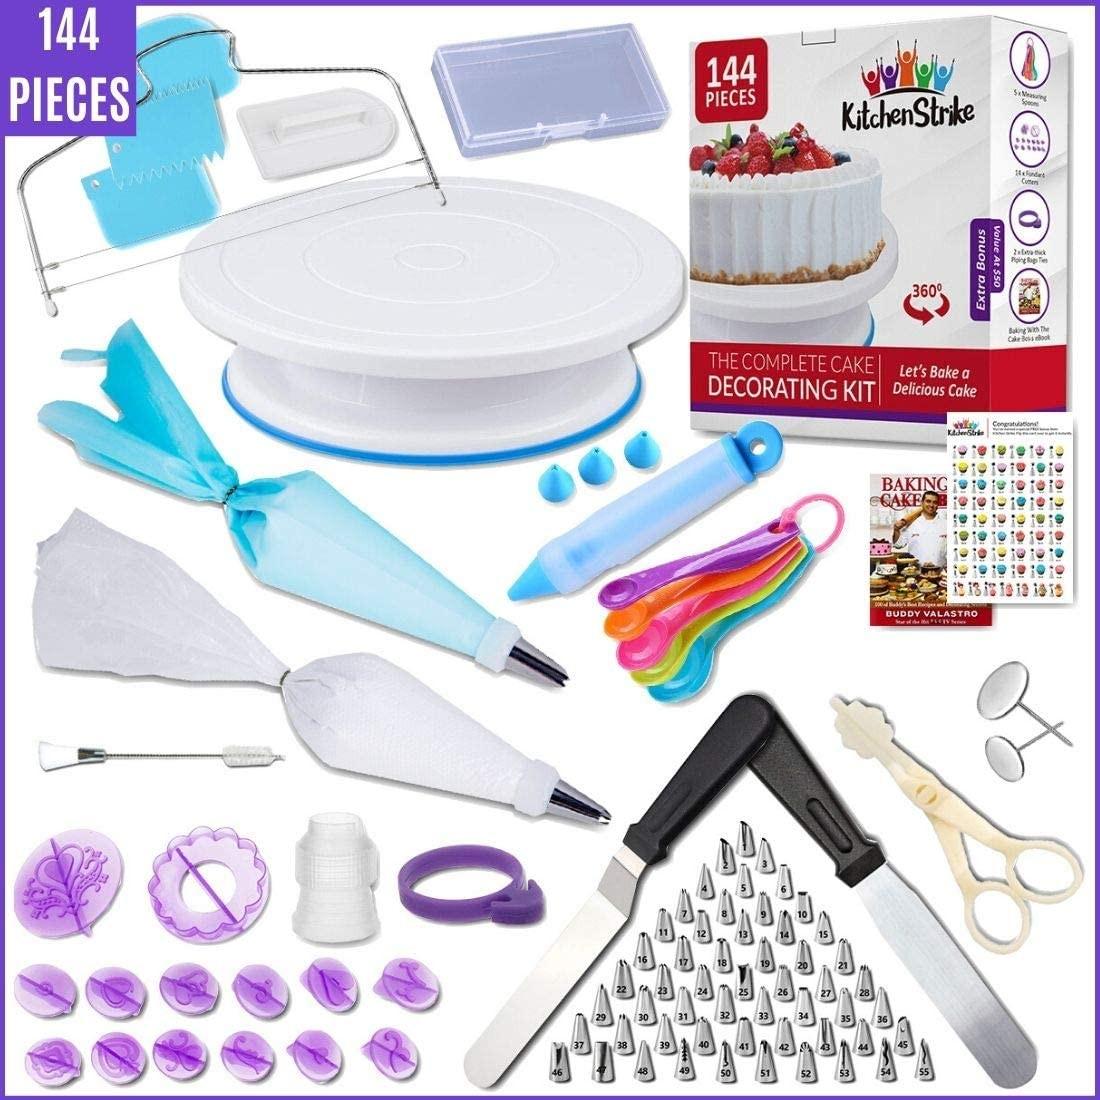 Kitchen Strike Cake Decorating Kit - 144 Piece Baking supplies With Bonus Accessories Of Fondant